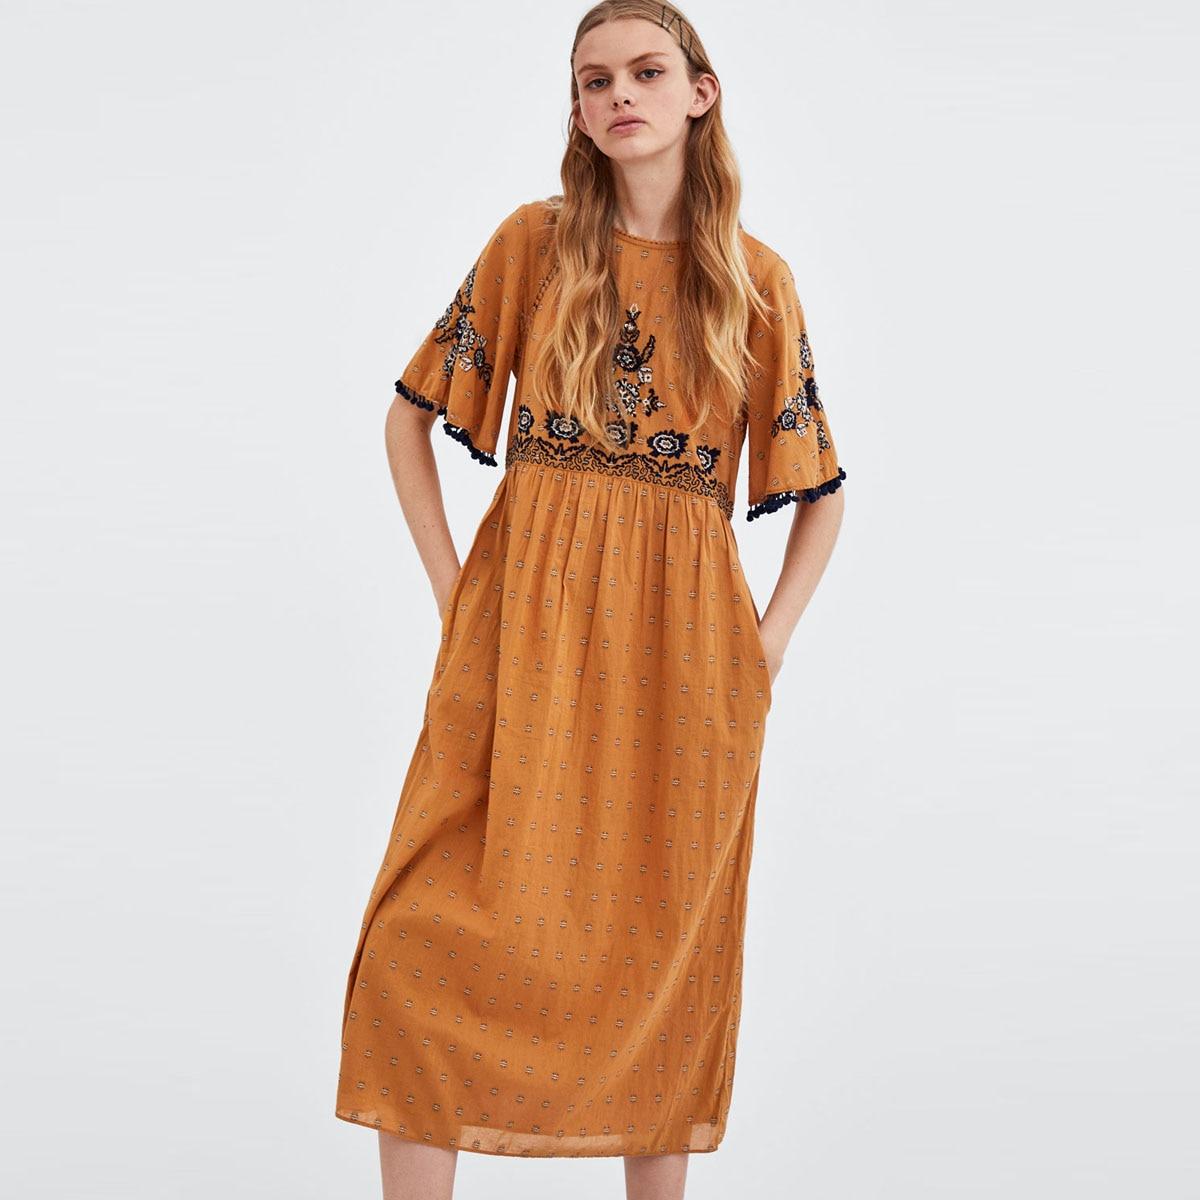 a8e5eea699a Flowy Sundresses Short